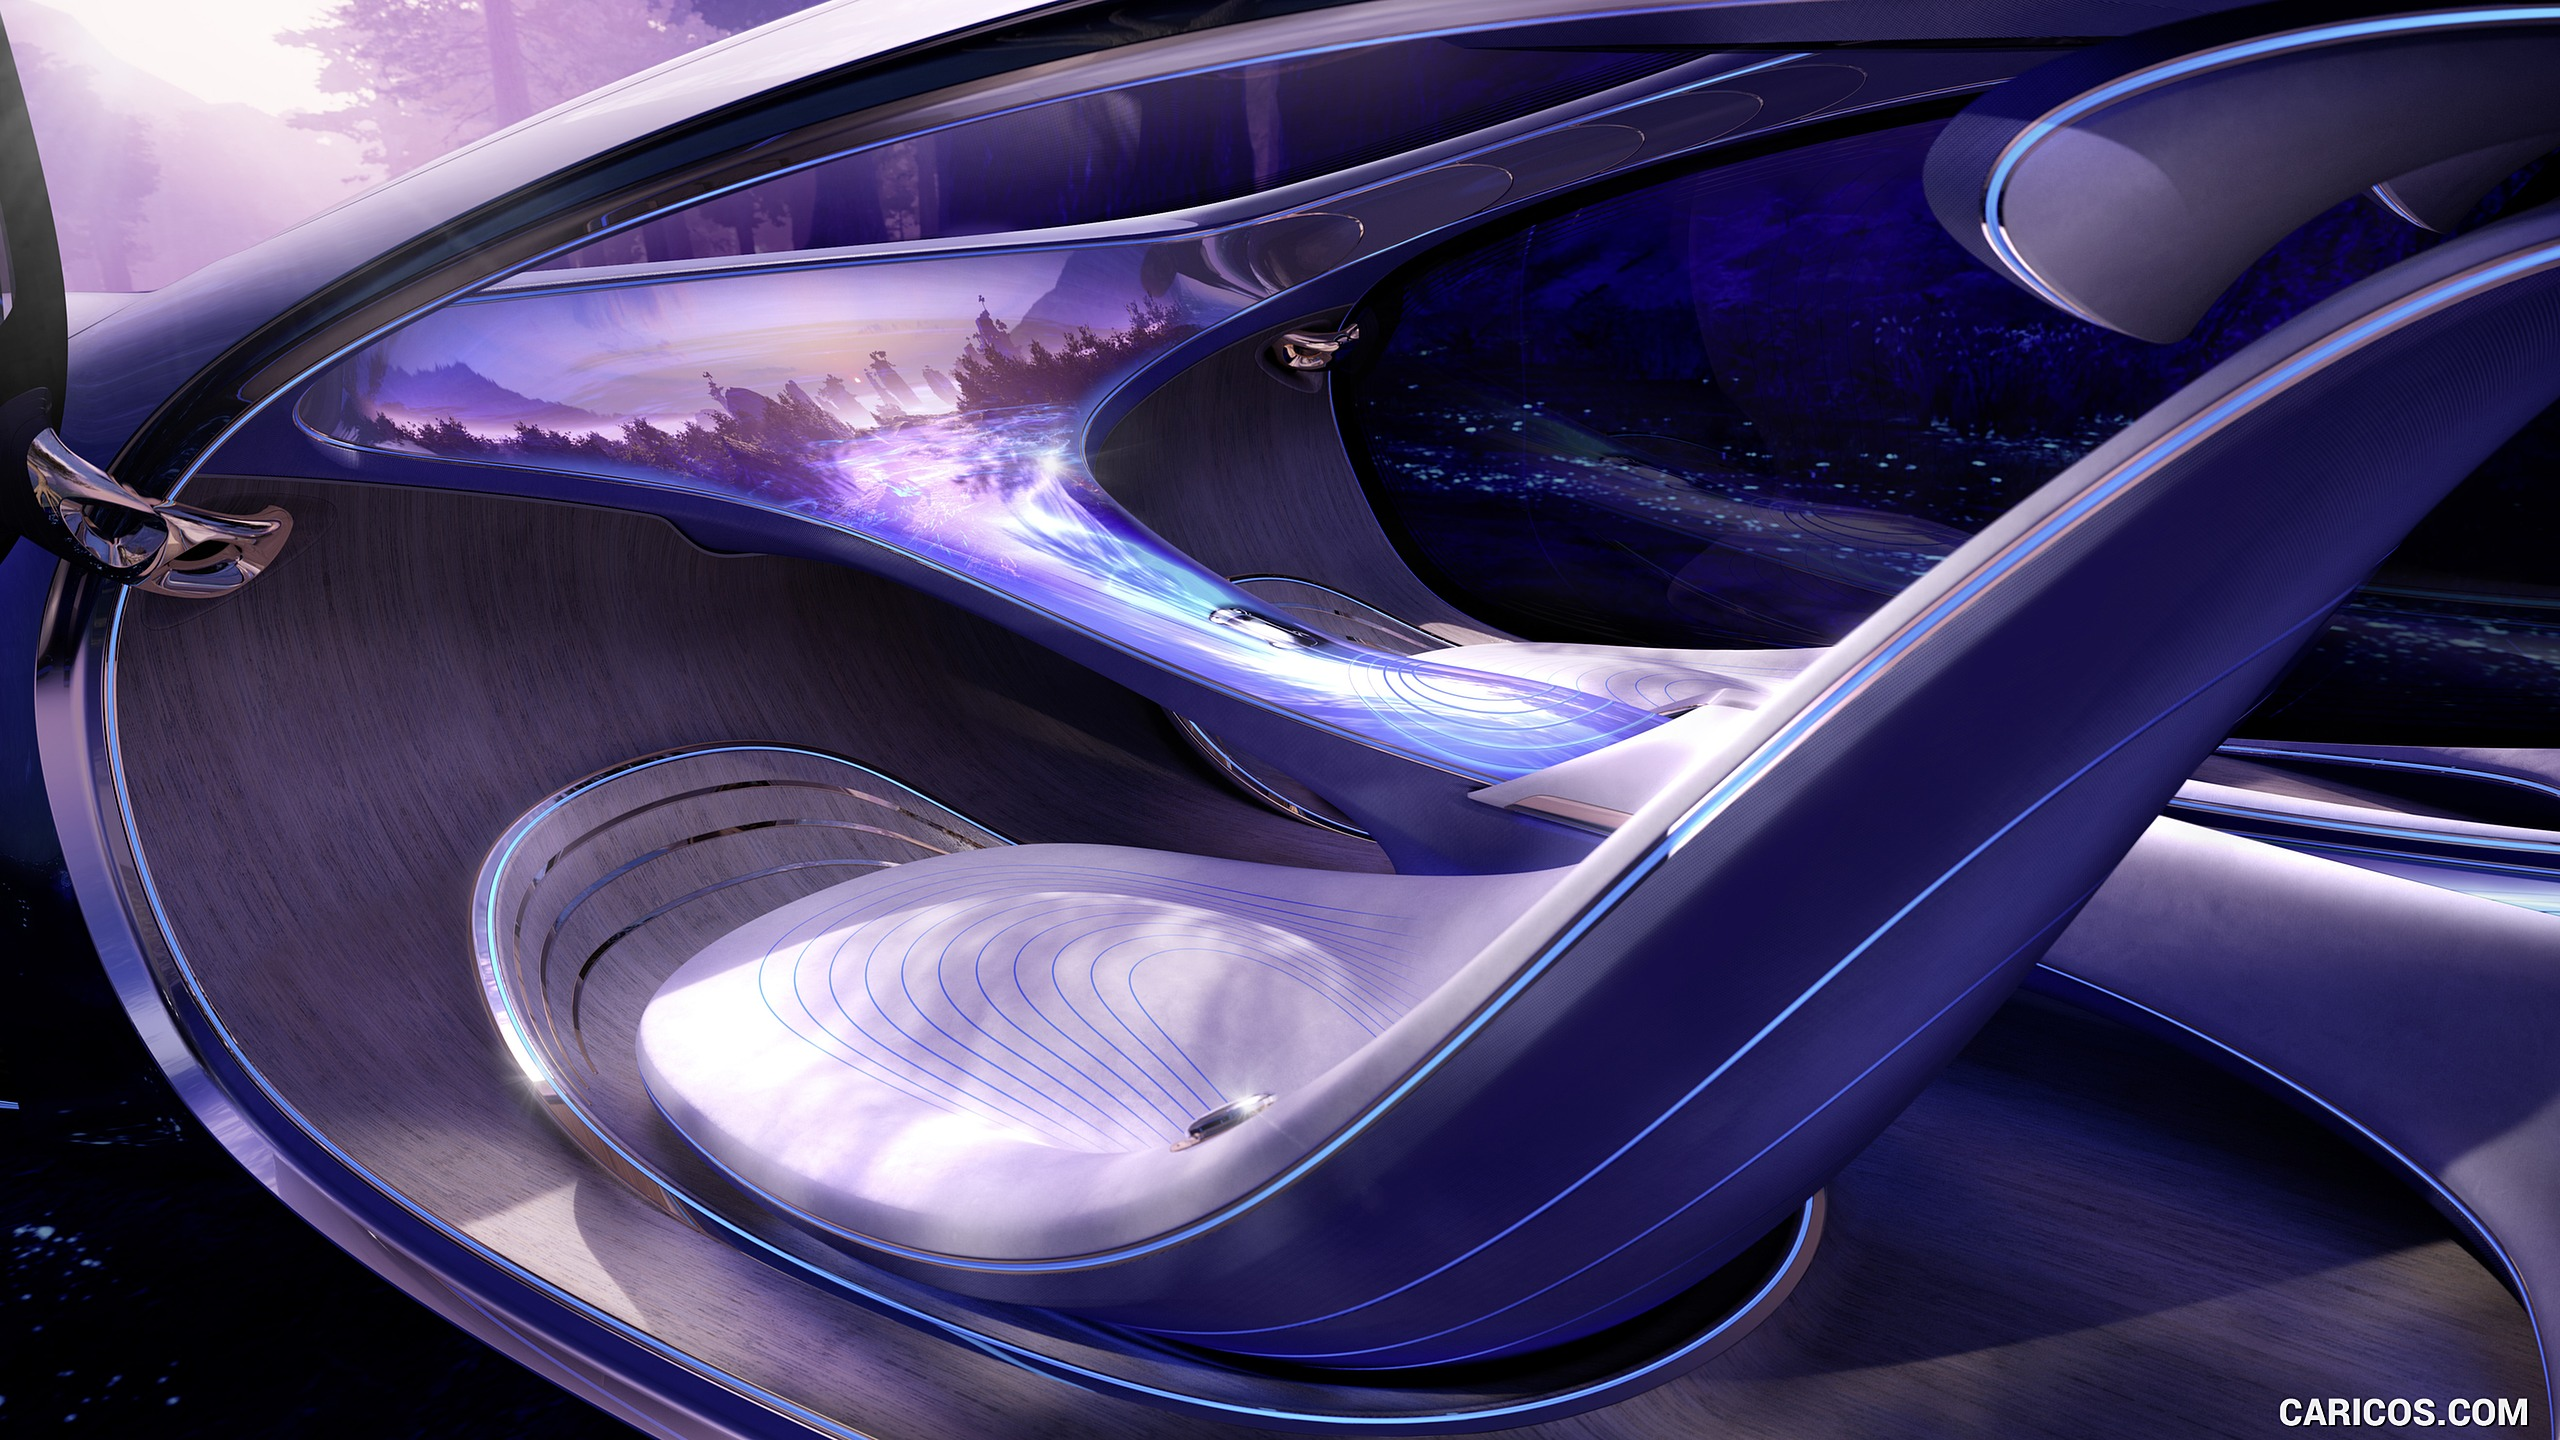 2020 Mercedes Benz VISION AVTR Concept   Interior HD Wallpaper 33 2560x1440